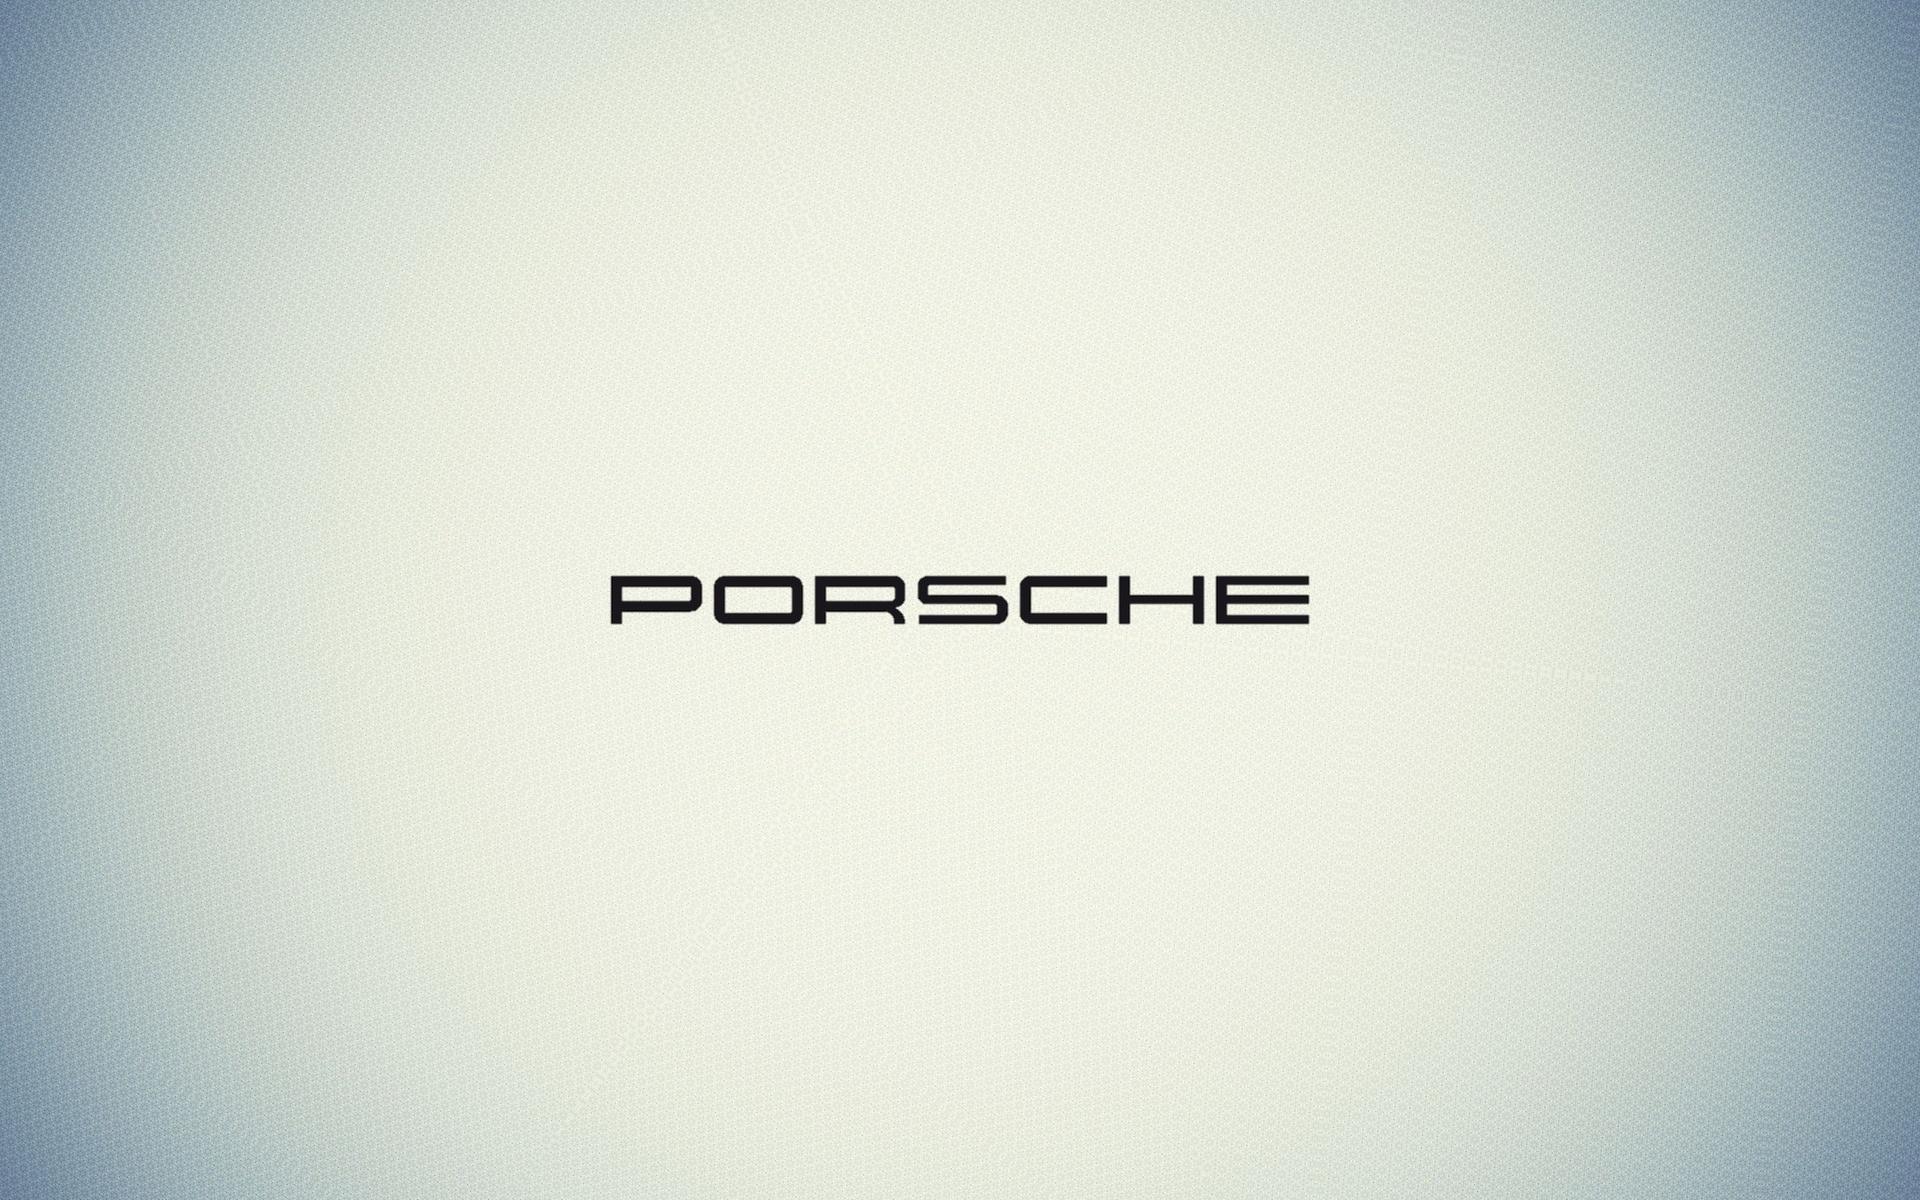 porsche logo desktop wallpaper 58886